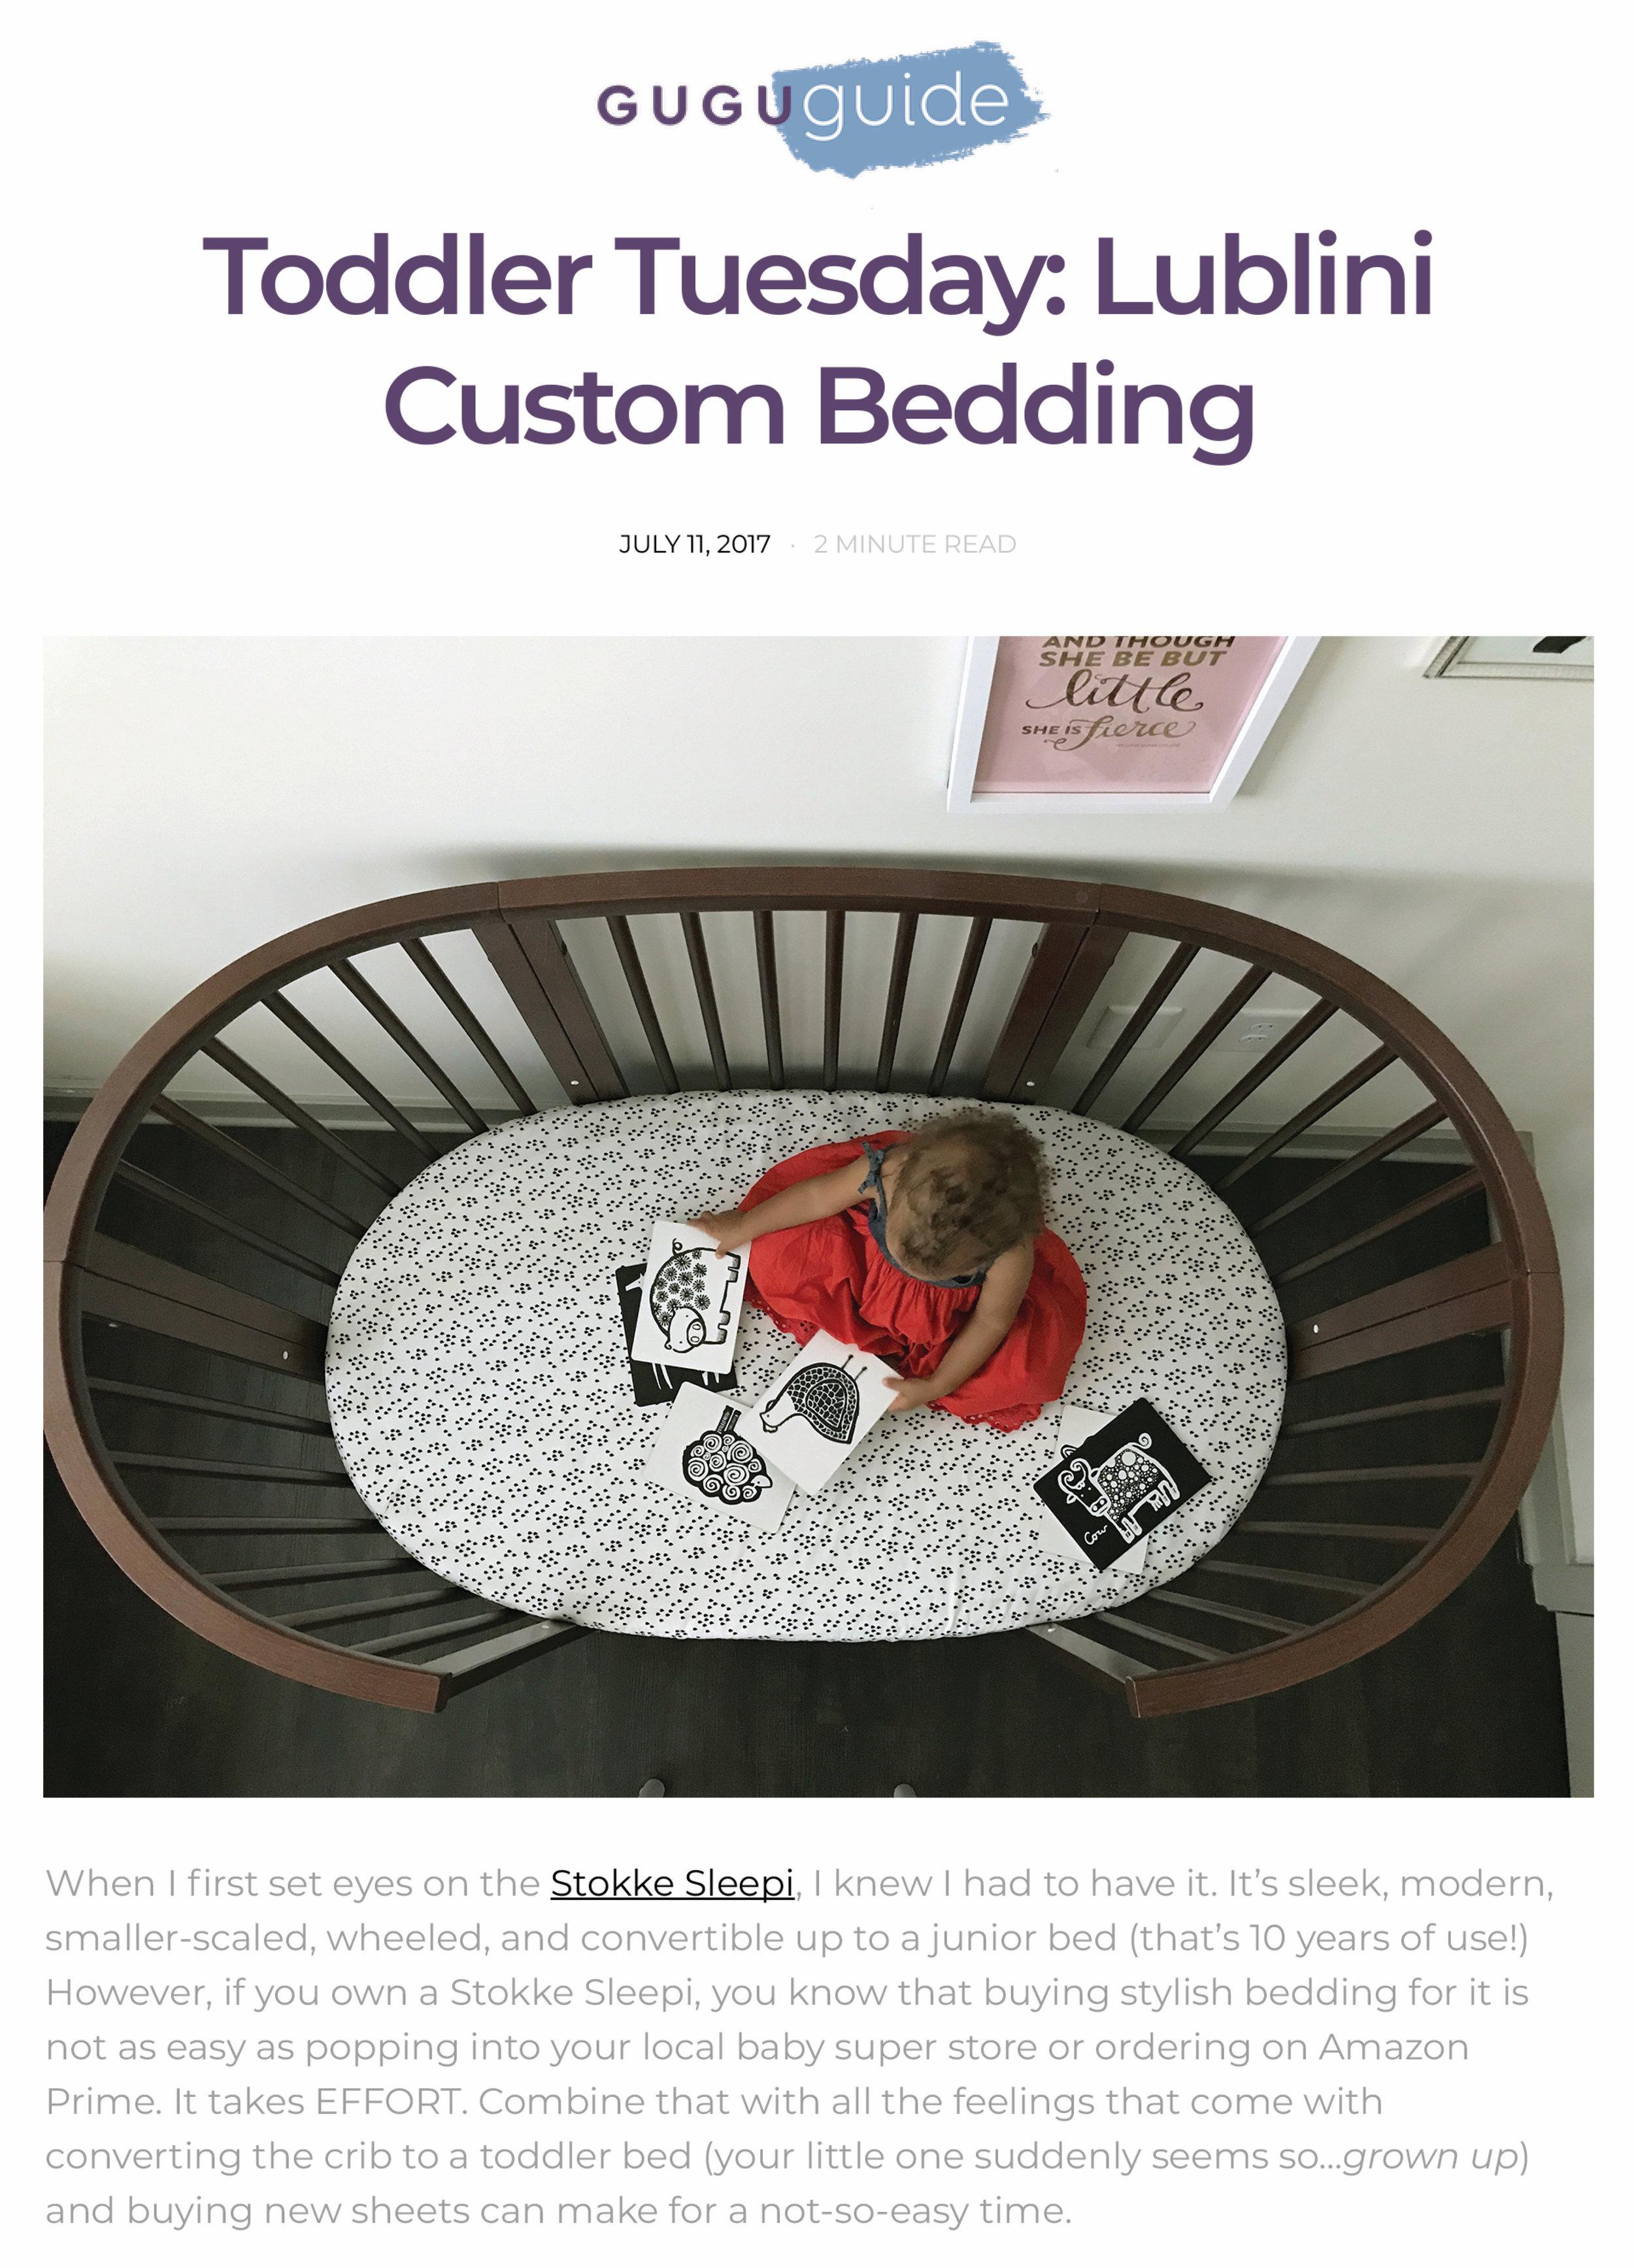 Lublini Custom Bedding - Gugu Guru-ToddlerTuesday.jpg